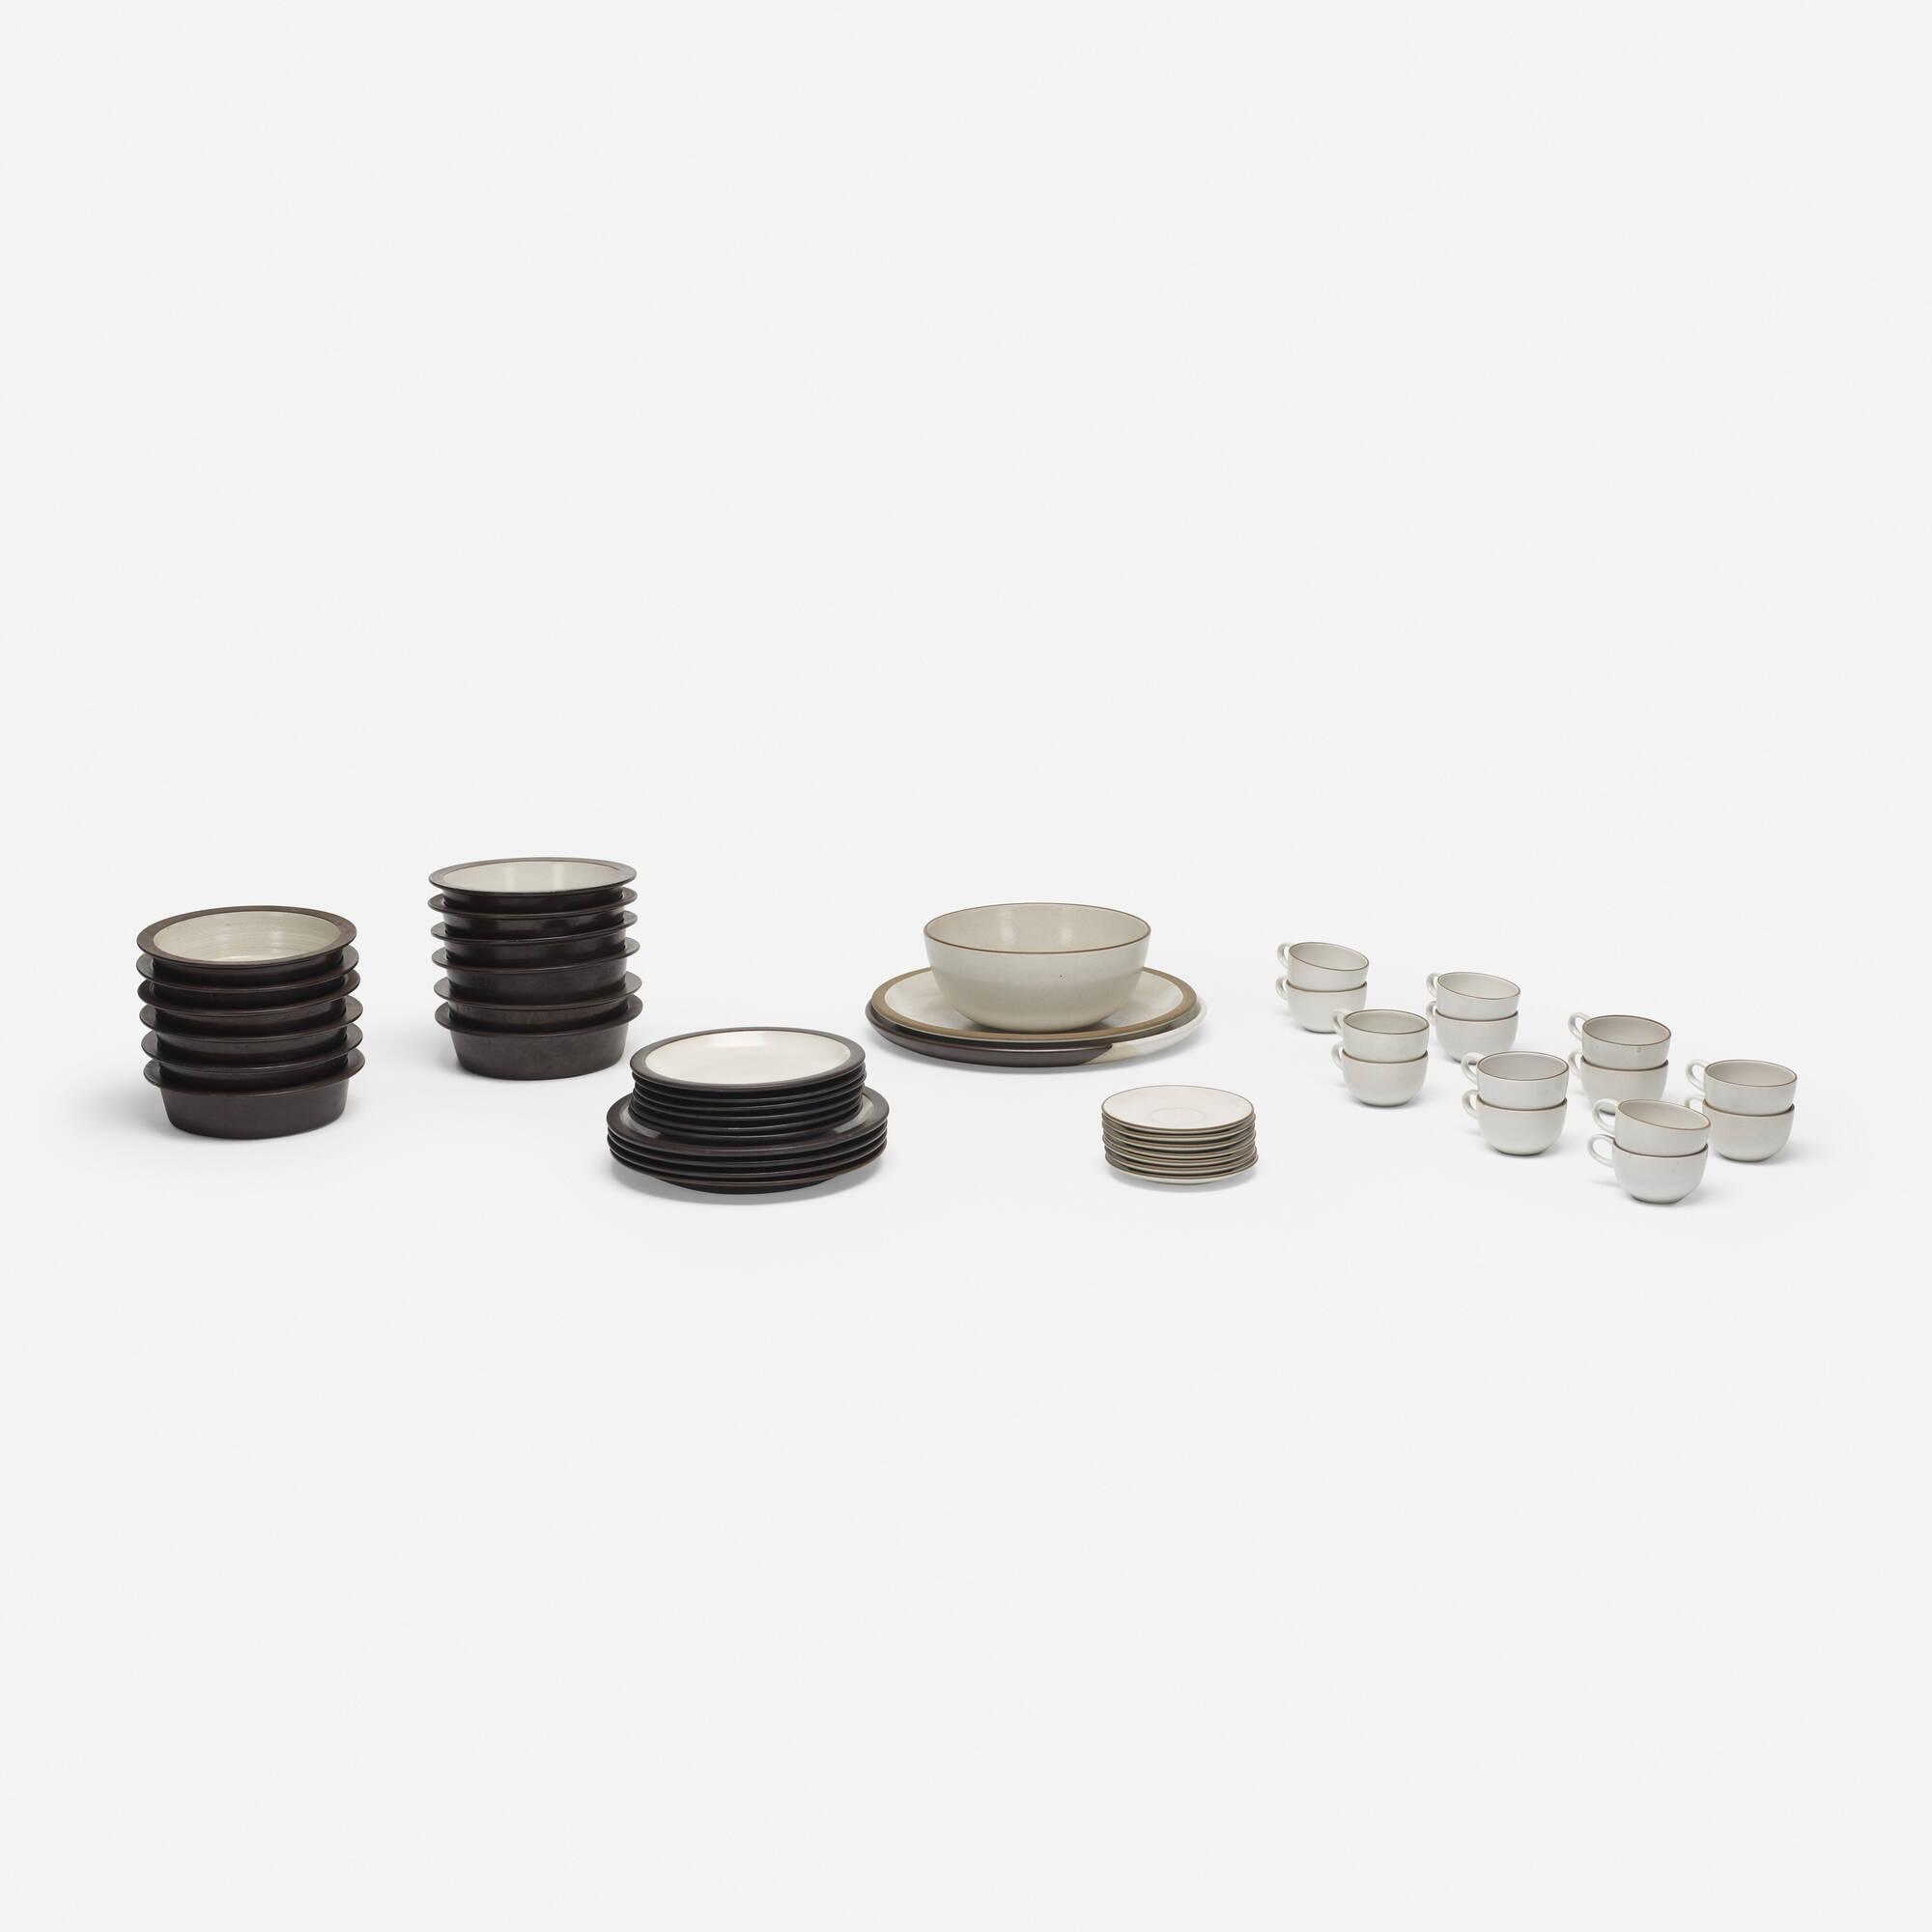 345: Heath / dinnerware collection (2 of 3)